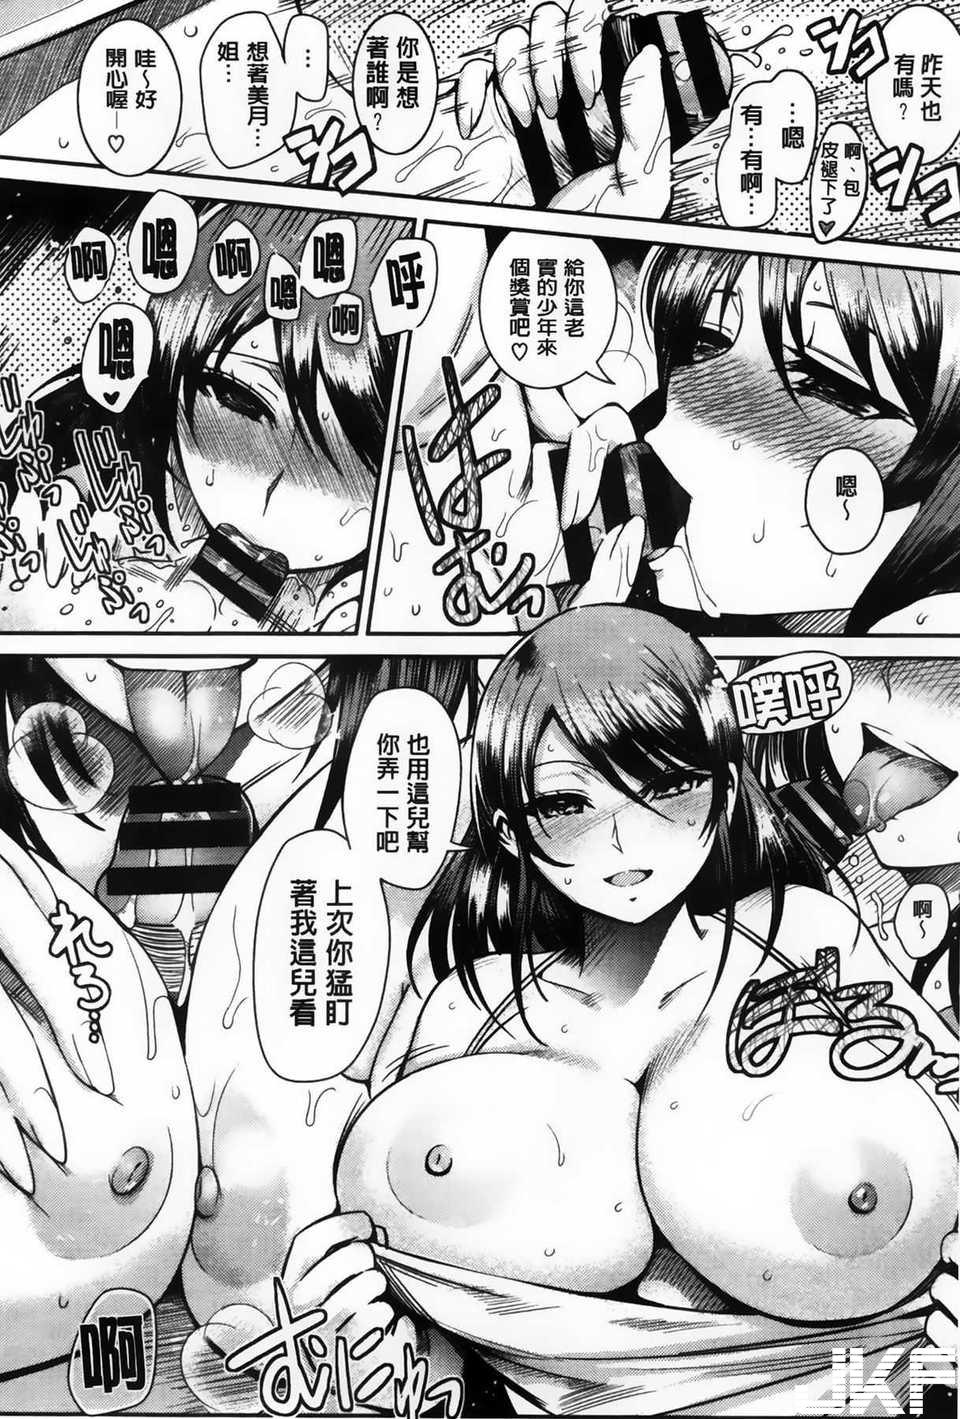 AoJiaoZero_028.jpg